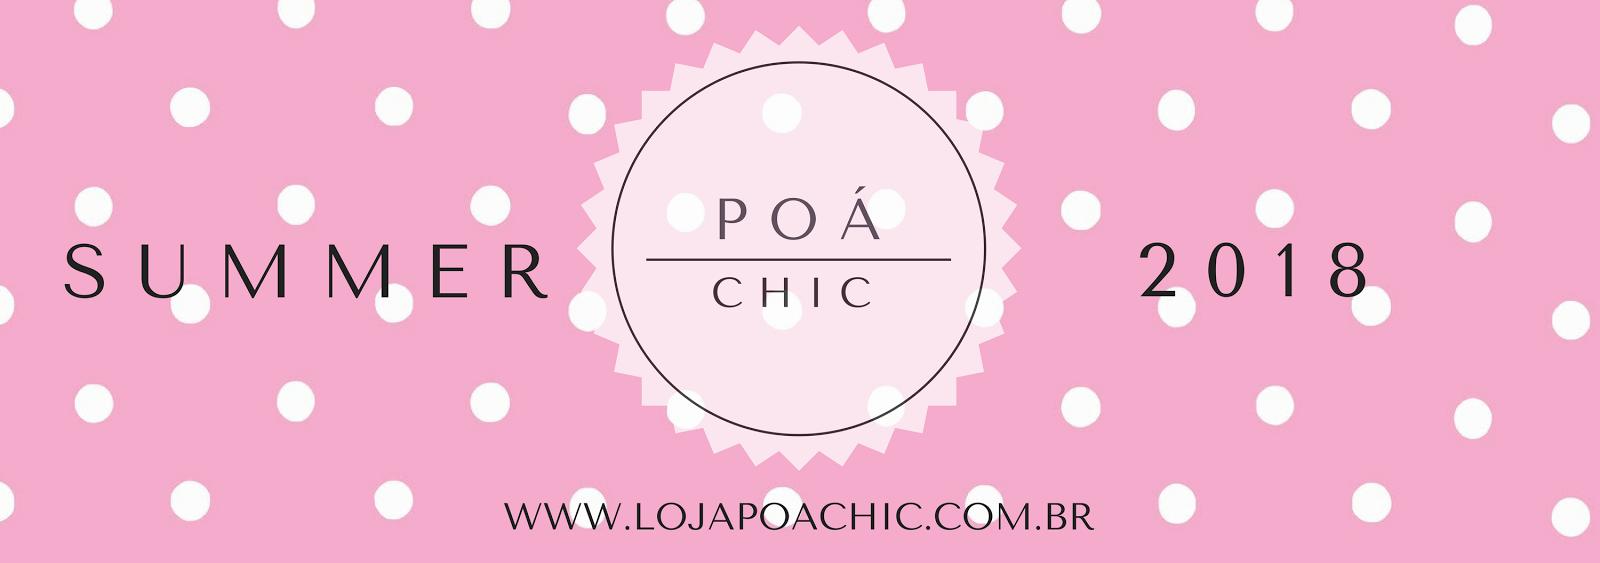 Acesse nossa Loja Online: www.lojapoachic.com.br